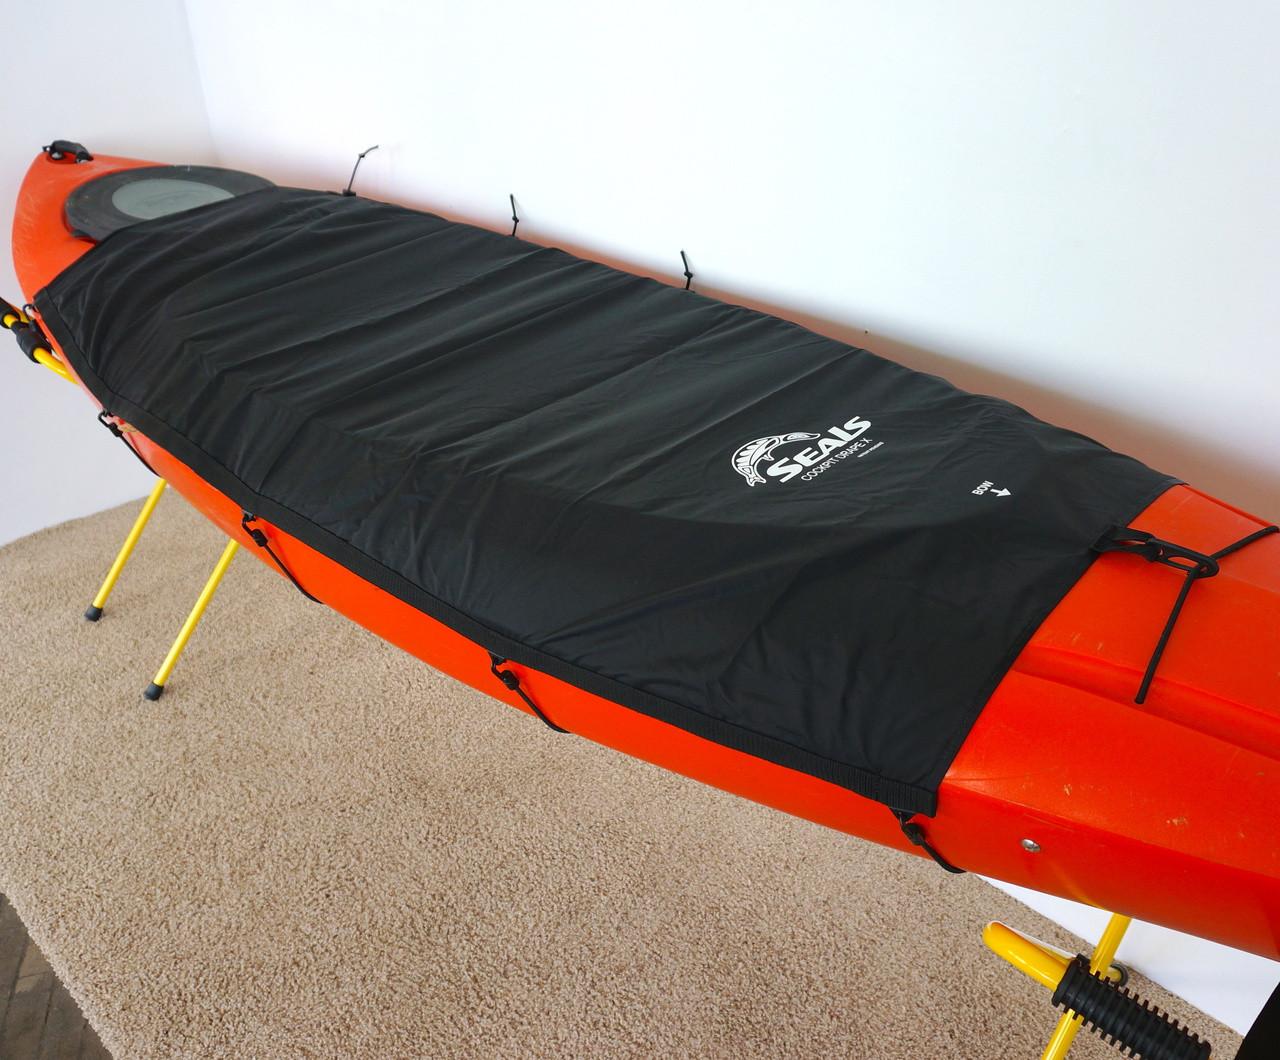 cockpit cover for recreational SOT kayaks